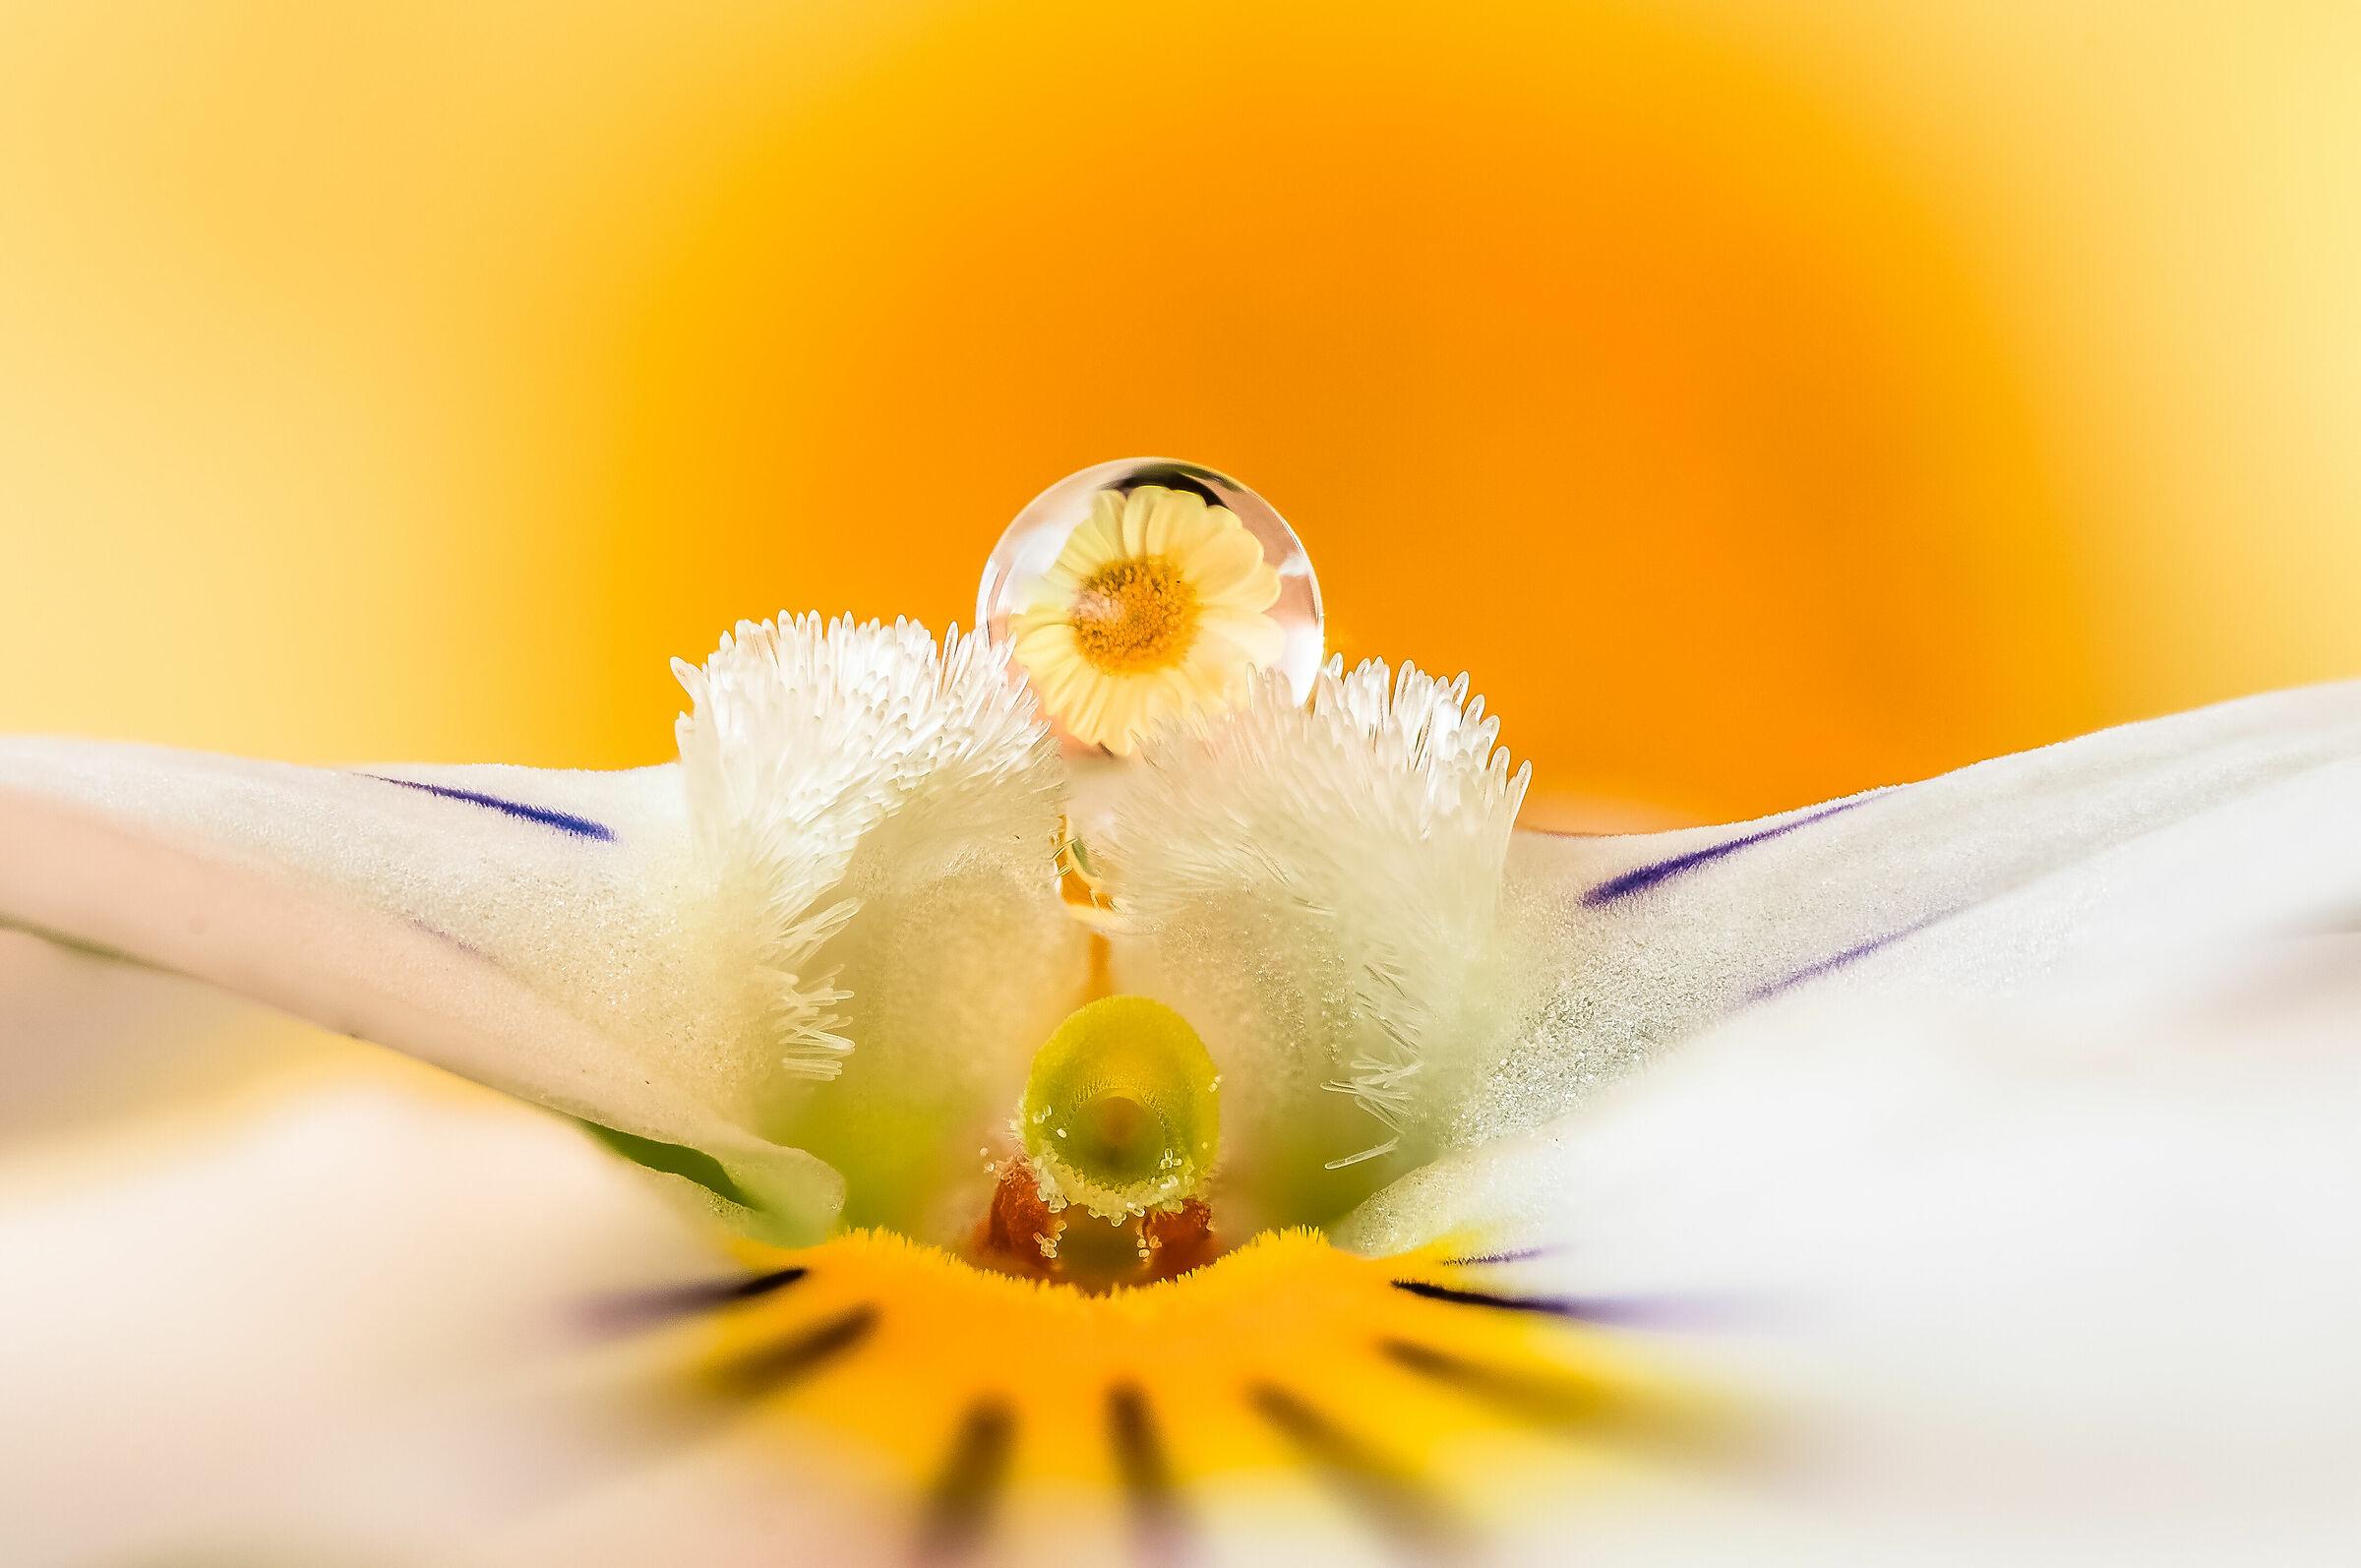 Drops & Flowers Gocce Fiori Riflessi Mario jr Nicorelli...